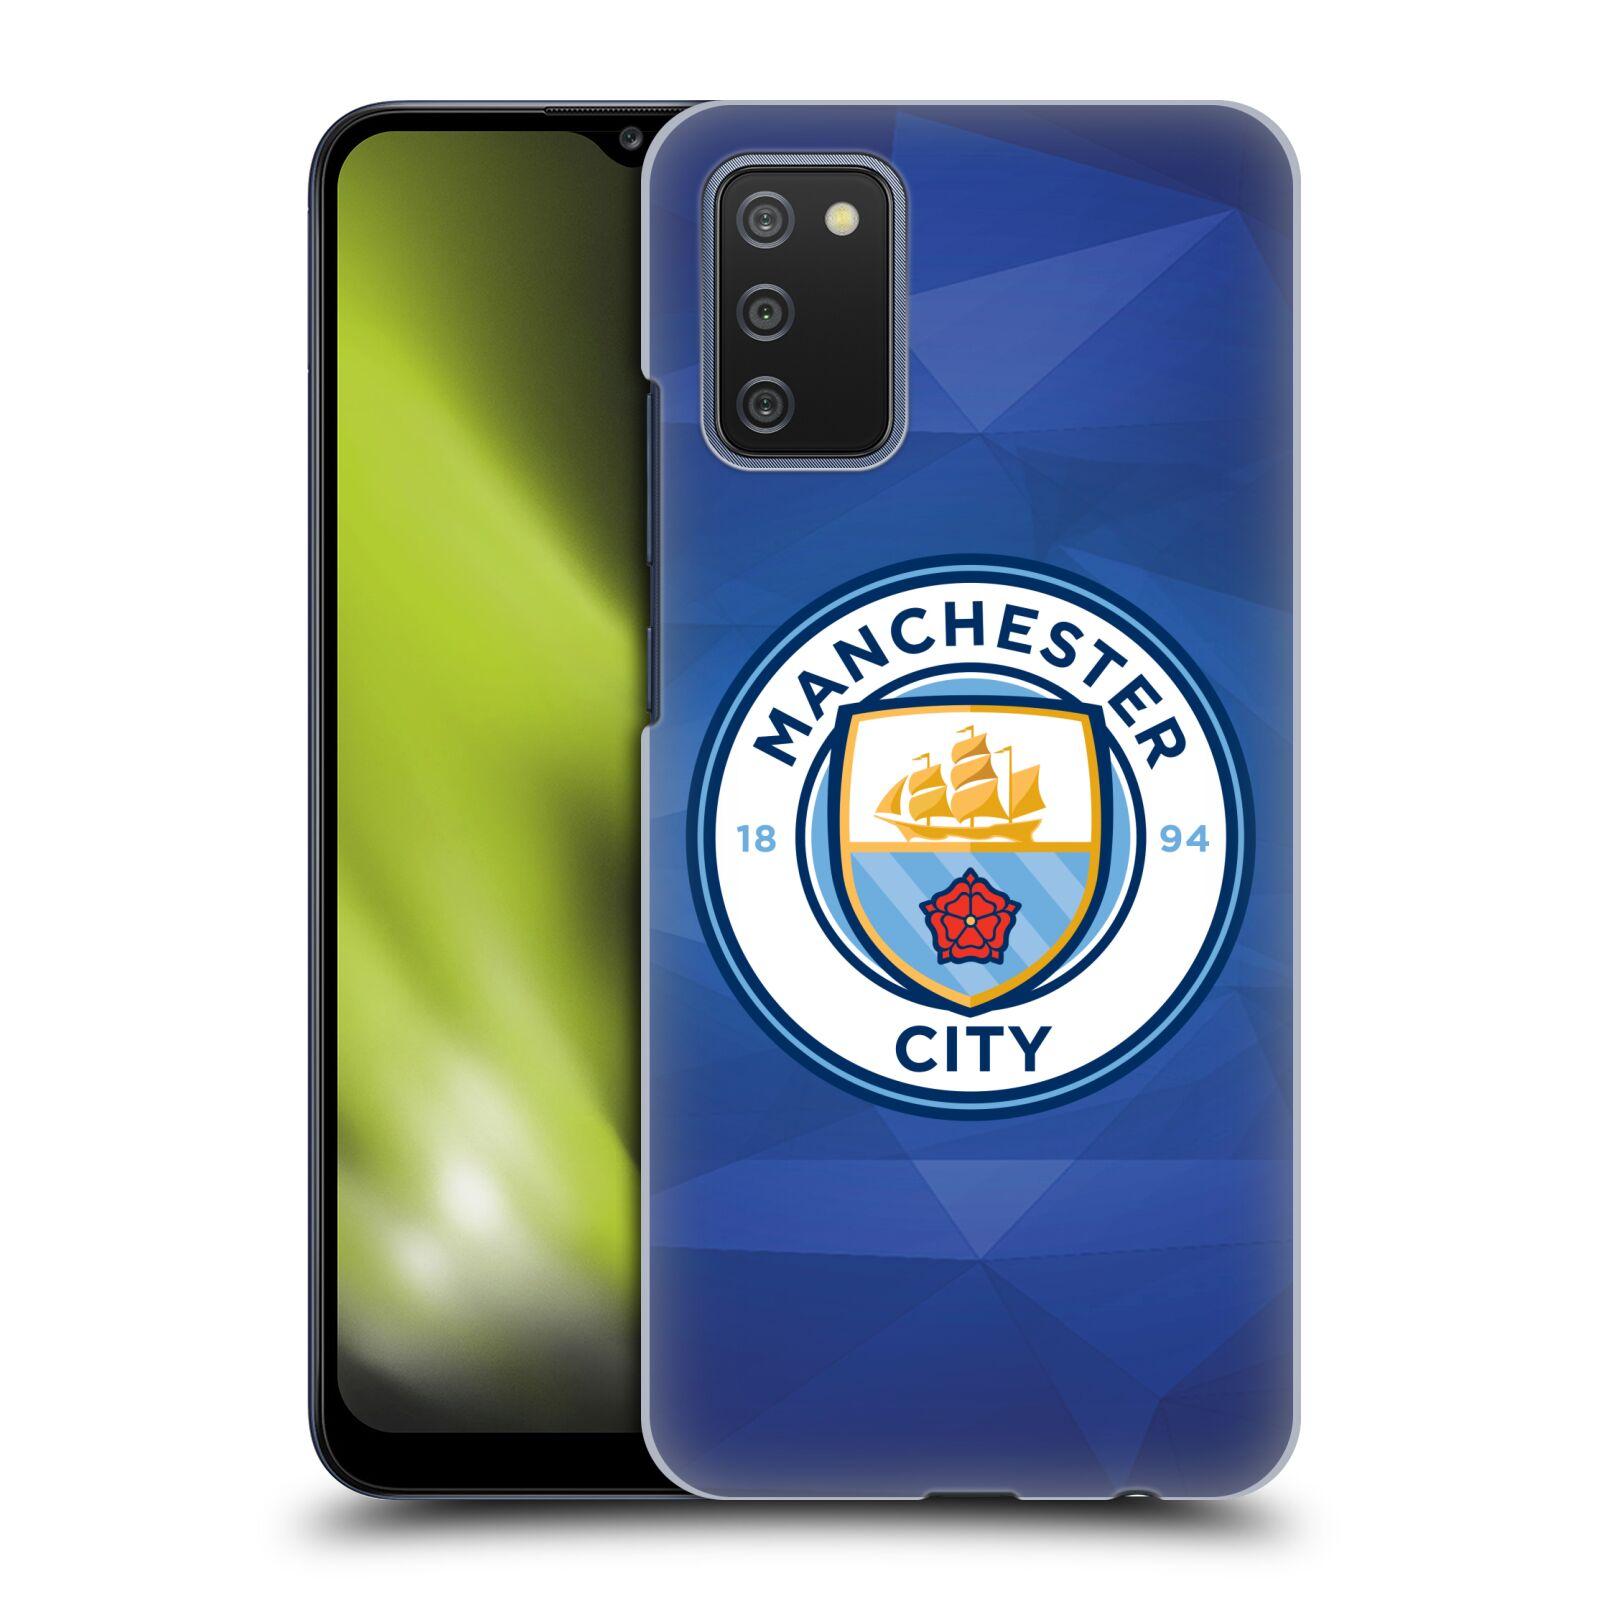 Plastové pouzdro na mobil Samsung Galaxy A02s - Head Case - Manchester City FC - Modré nové logo